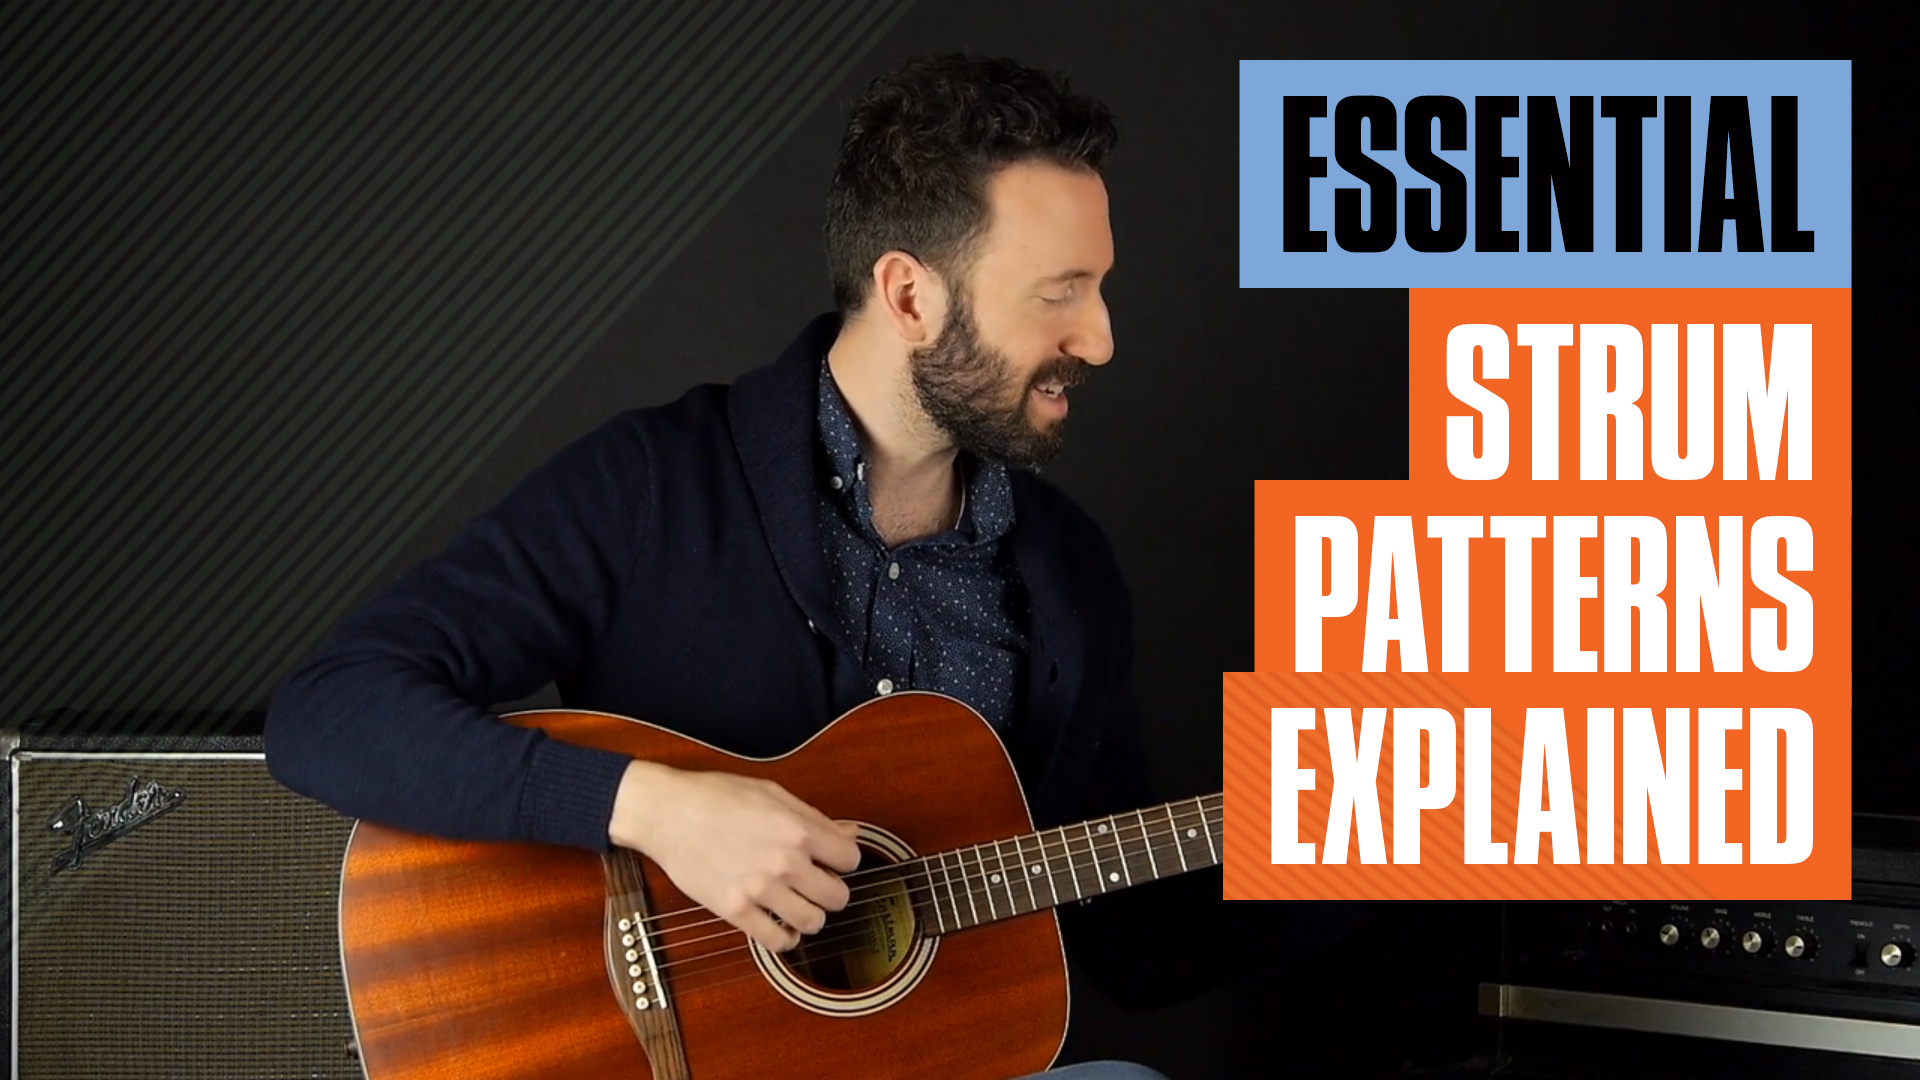 EssentialStrum Patterns YT Thumb